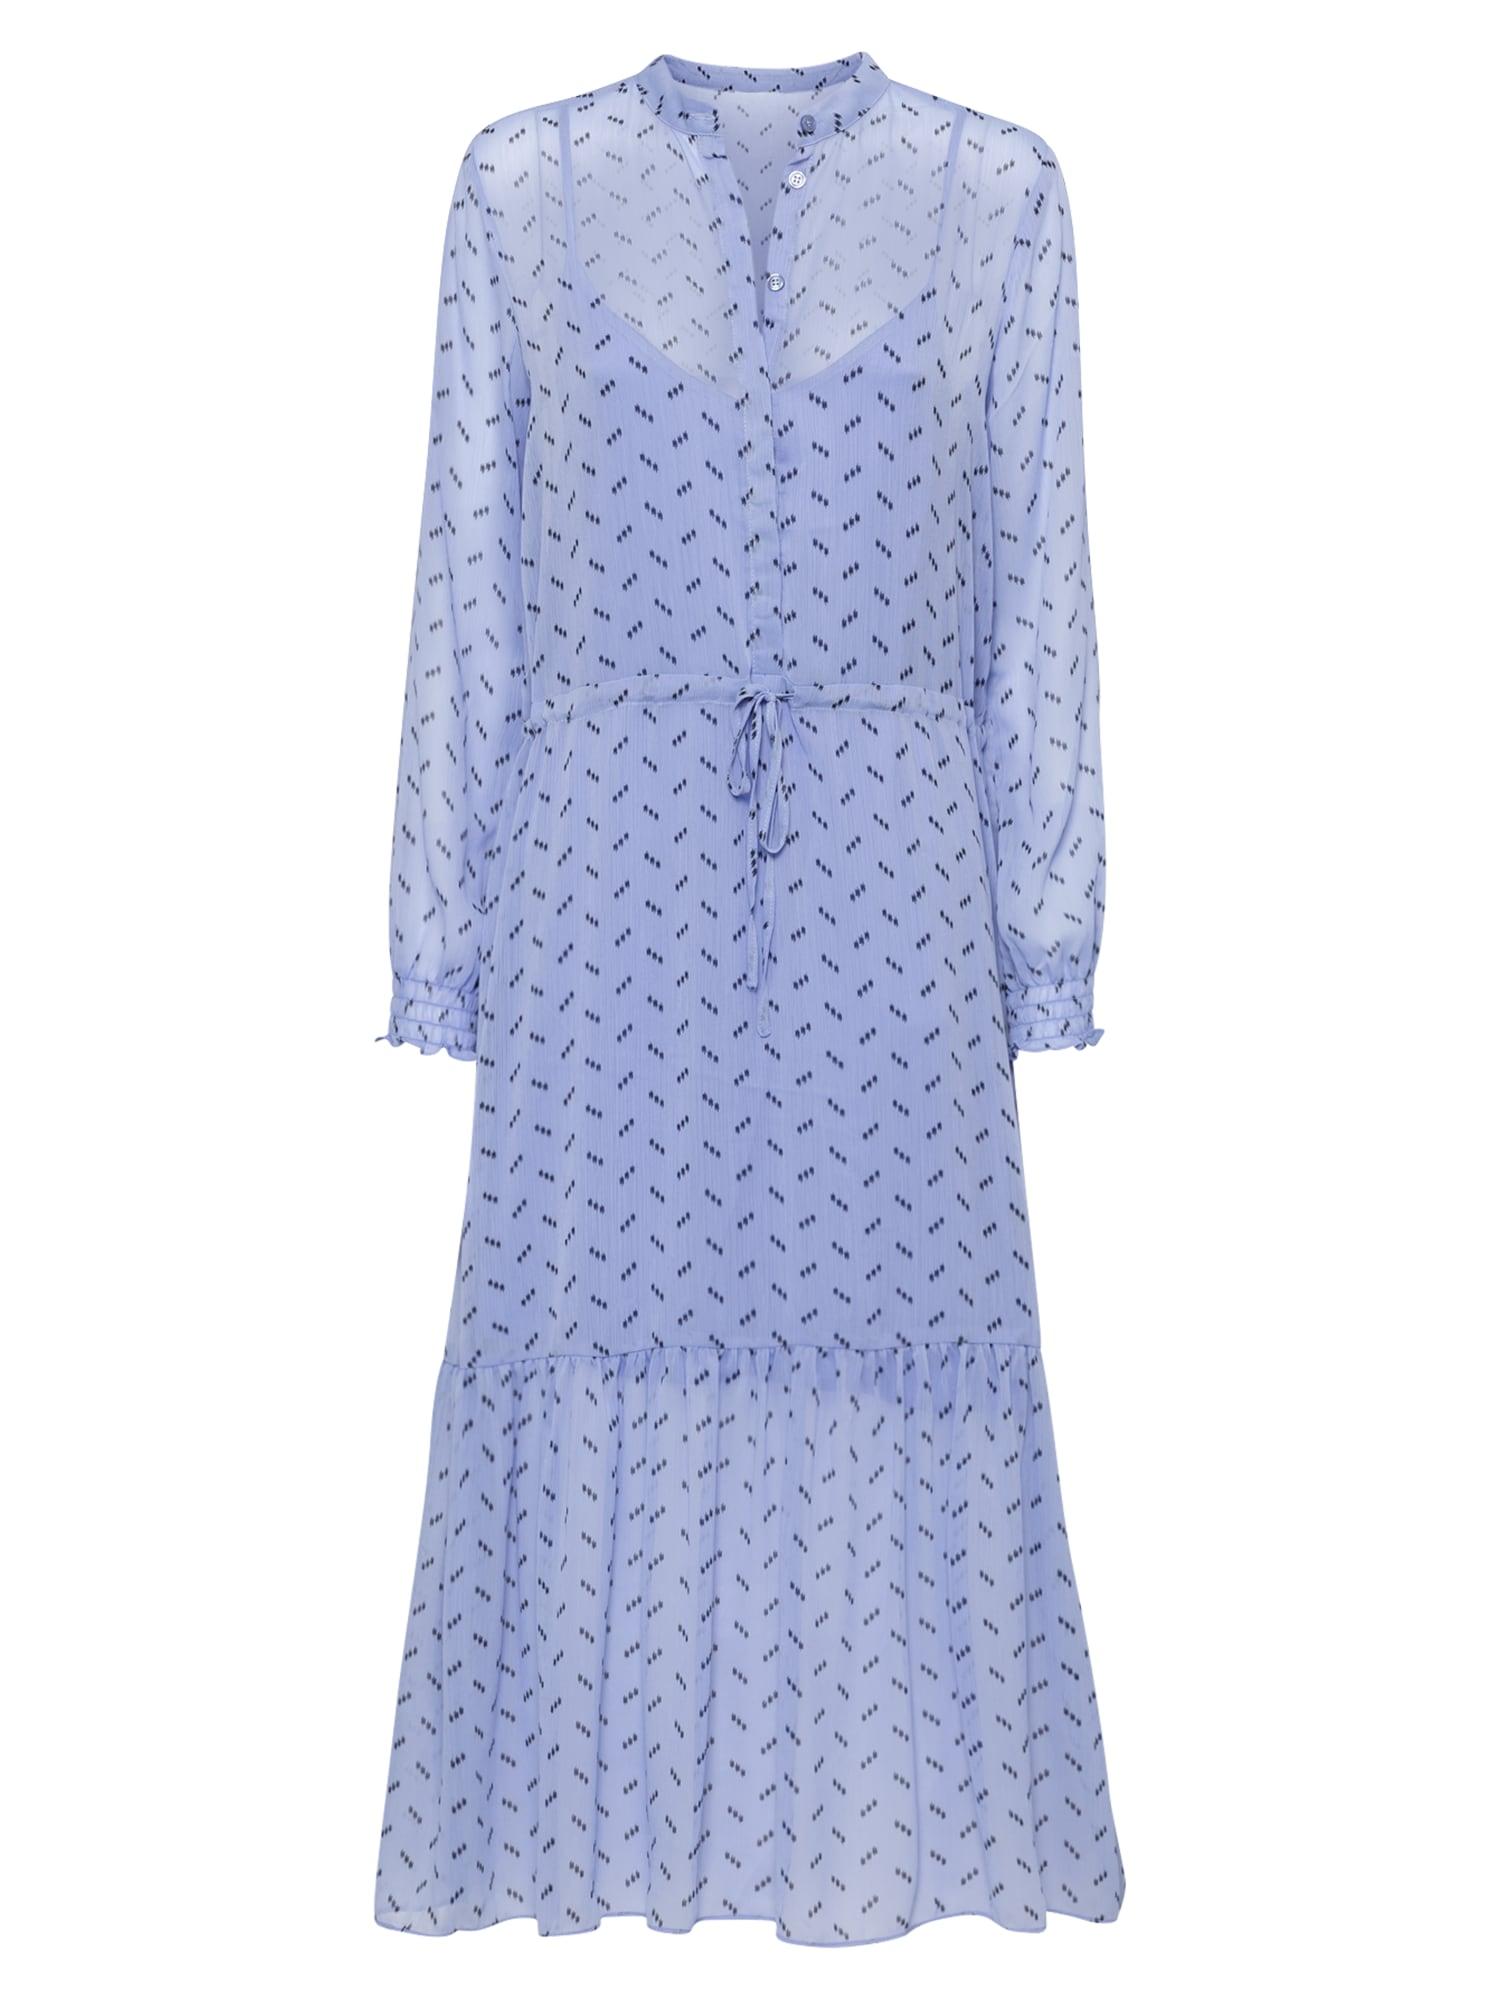 mbym Robe-chemise 'Diaz'  - Bleu - Taille: XS - female